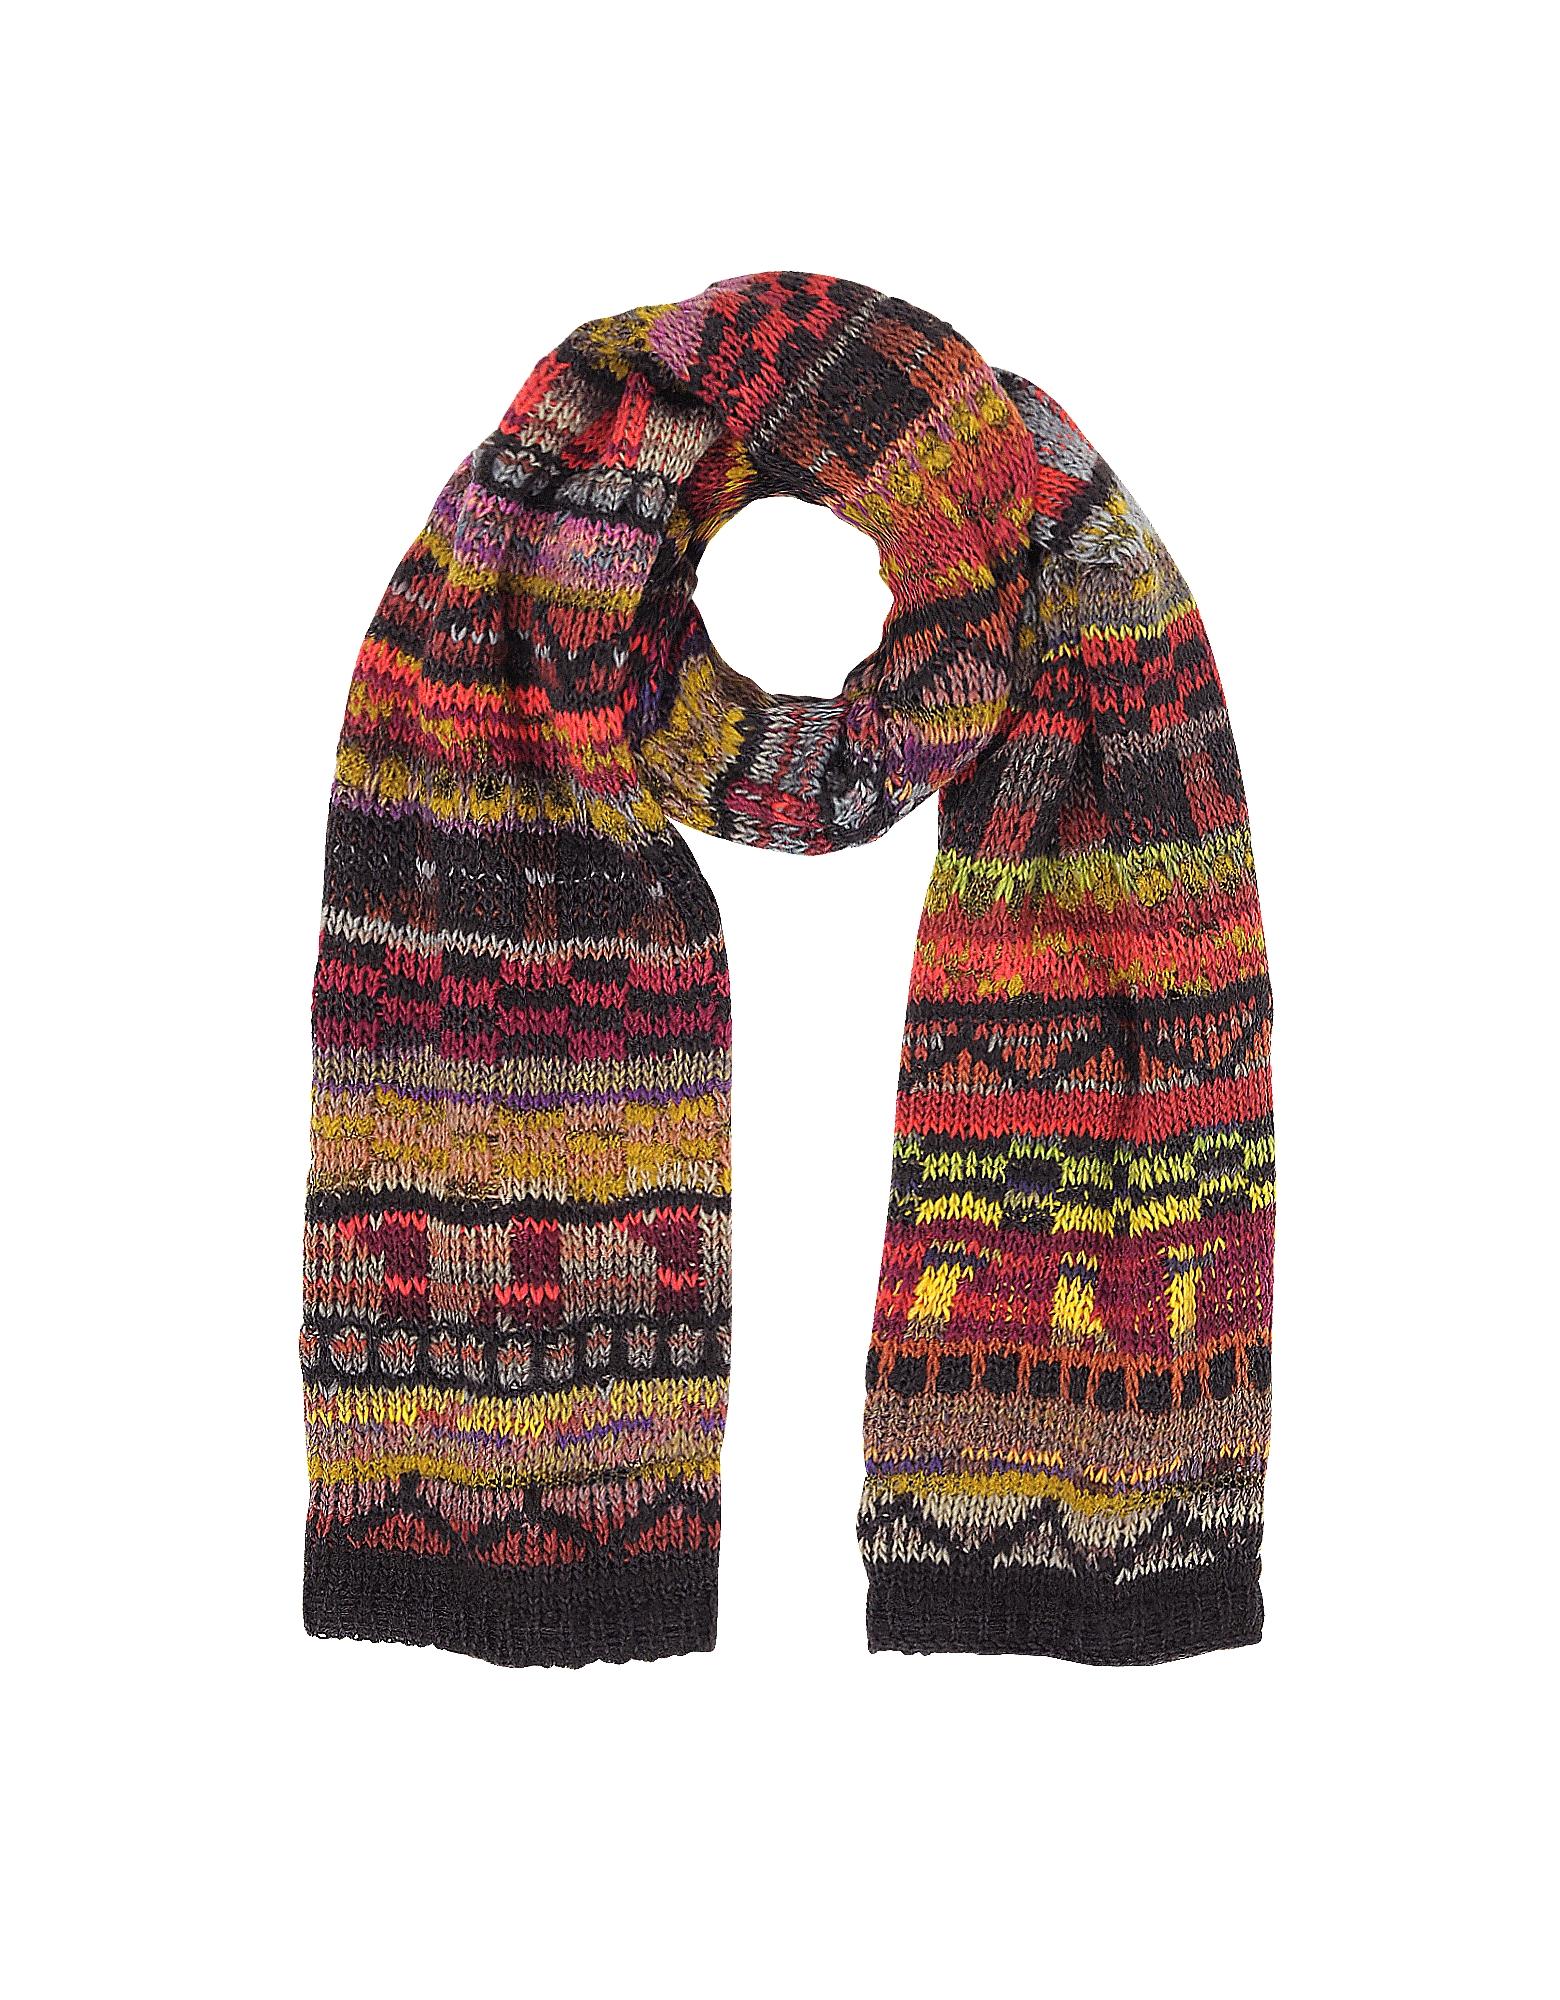 Missoni Men's Scarves, Wool Blend Knit Men's Long Scarf